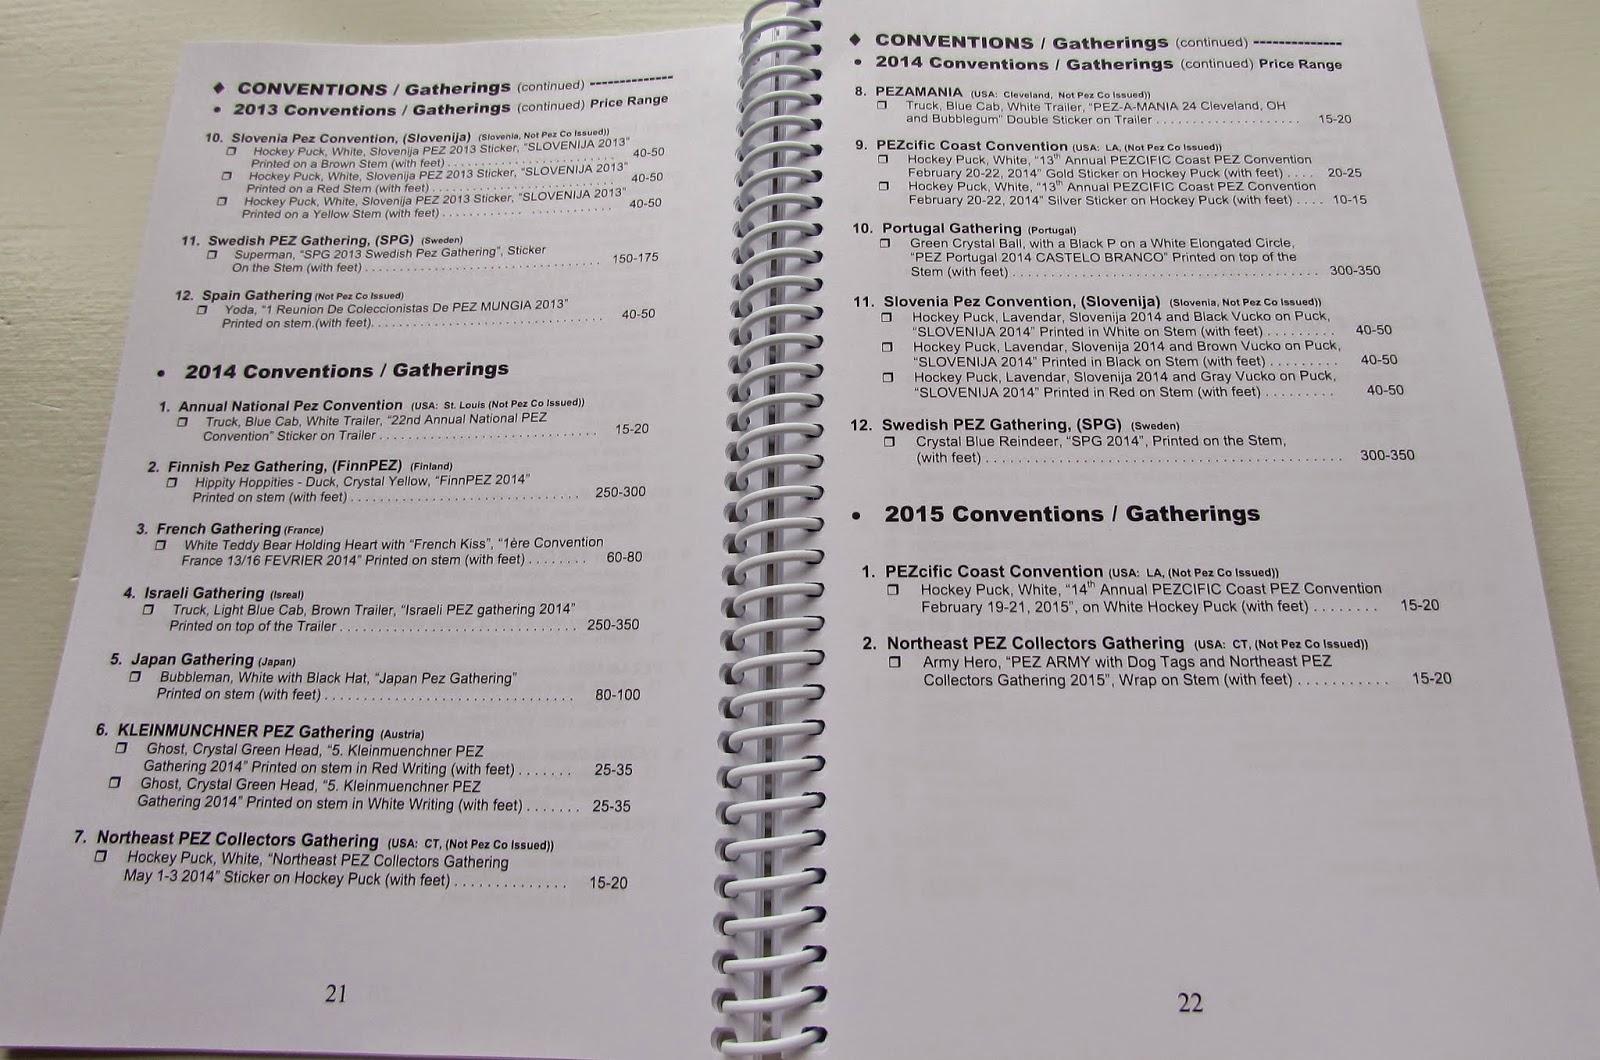 Pez Palz Friends of PEZ: Price Guide for PEZ 26th Edition...